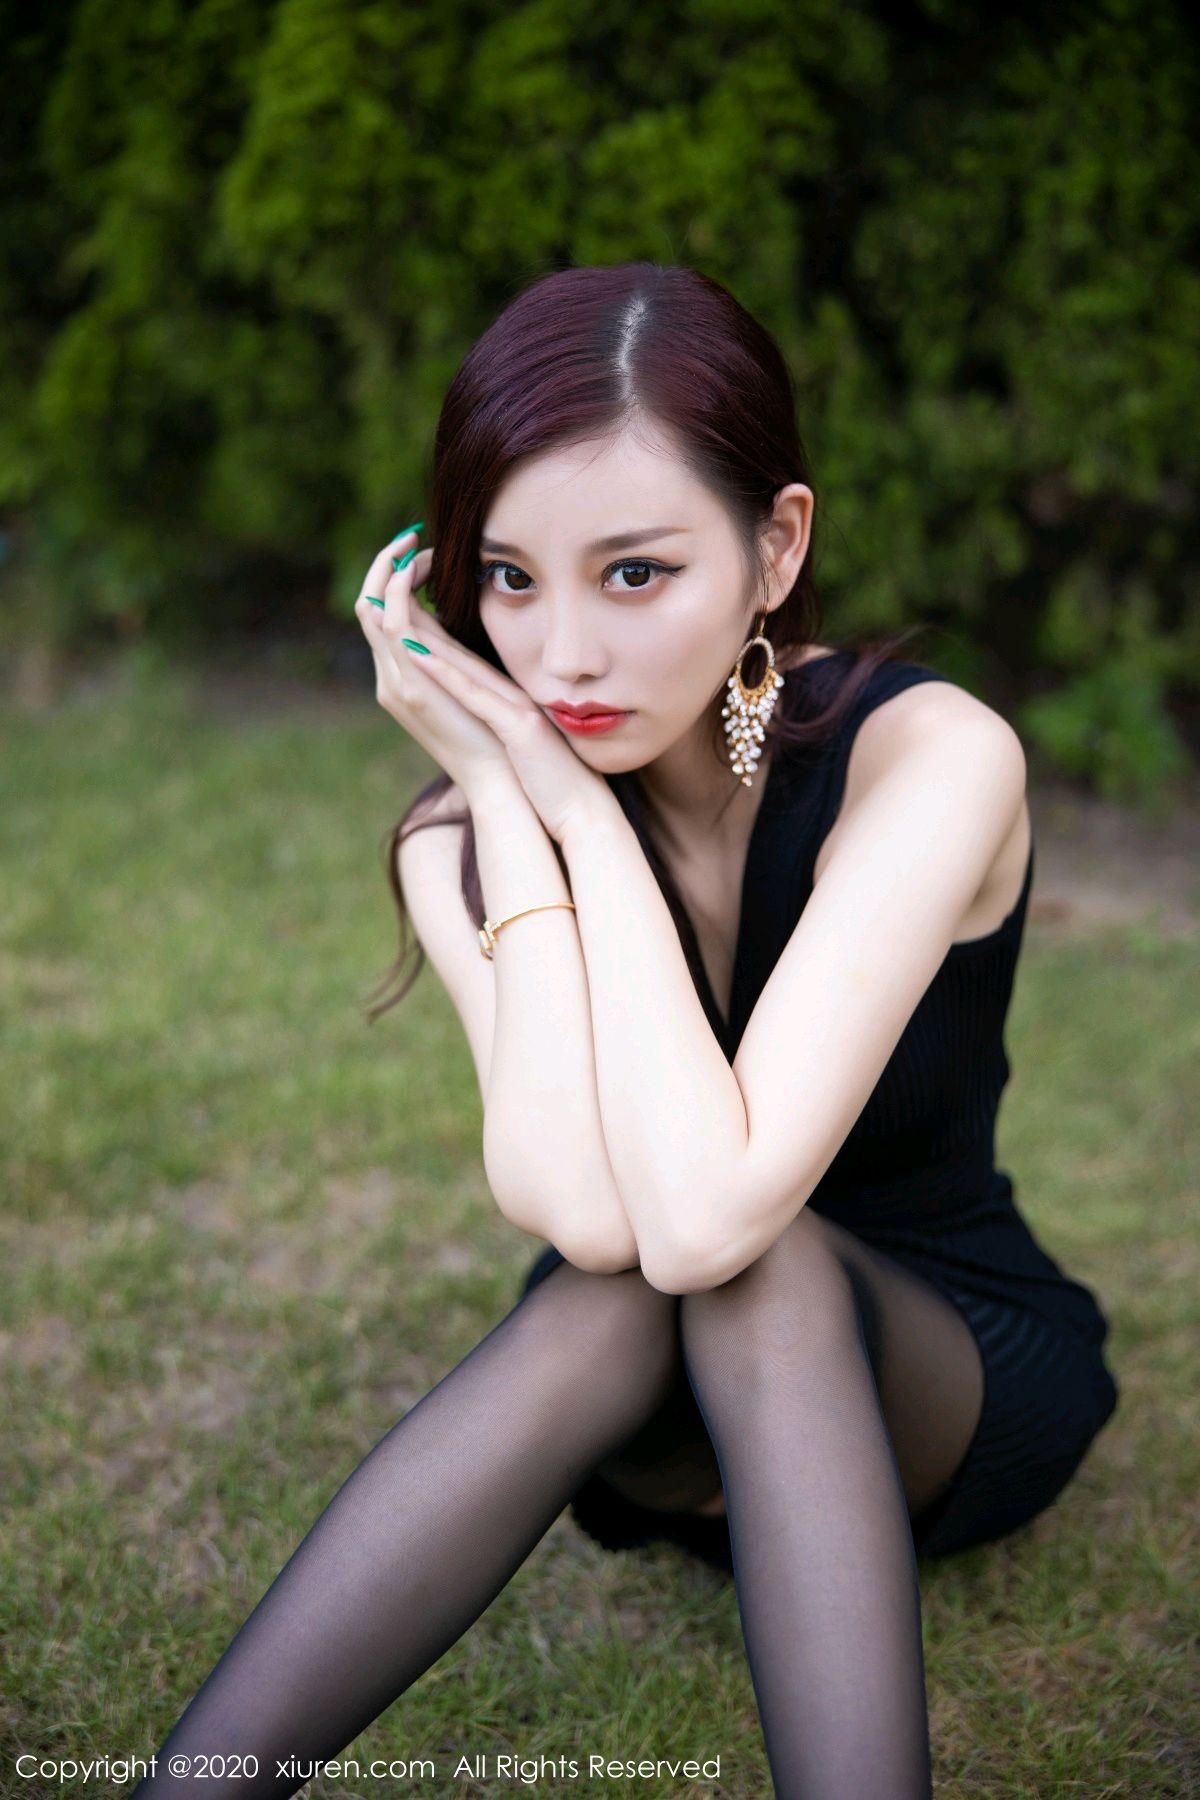 [XiuRen] Vol.2648 Yang Chen Chen 16P, Black Silk, Outdoor, Xiuren, Yang Chen Chen